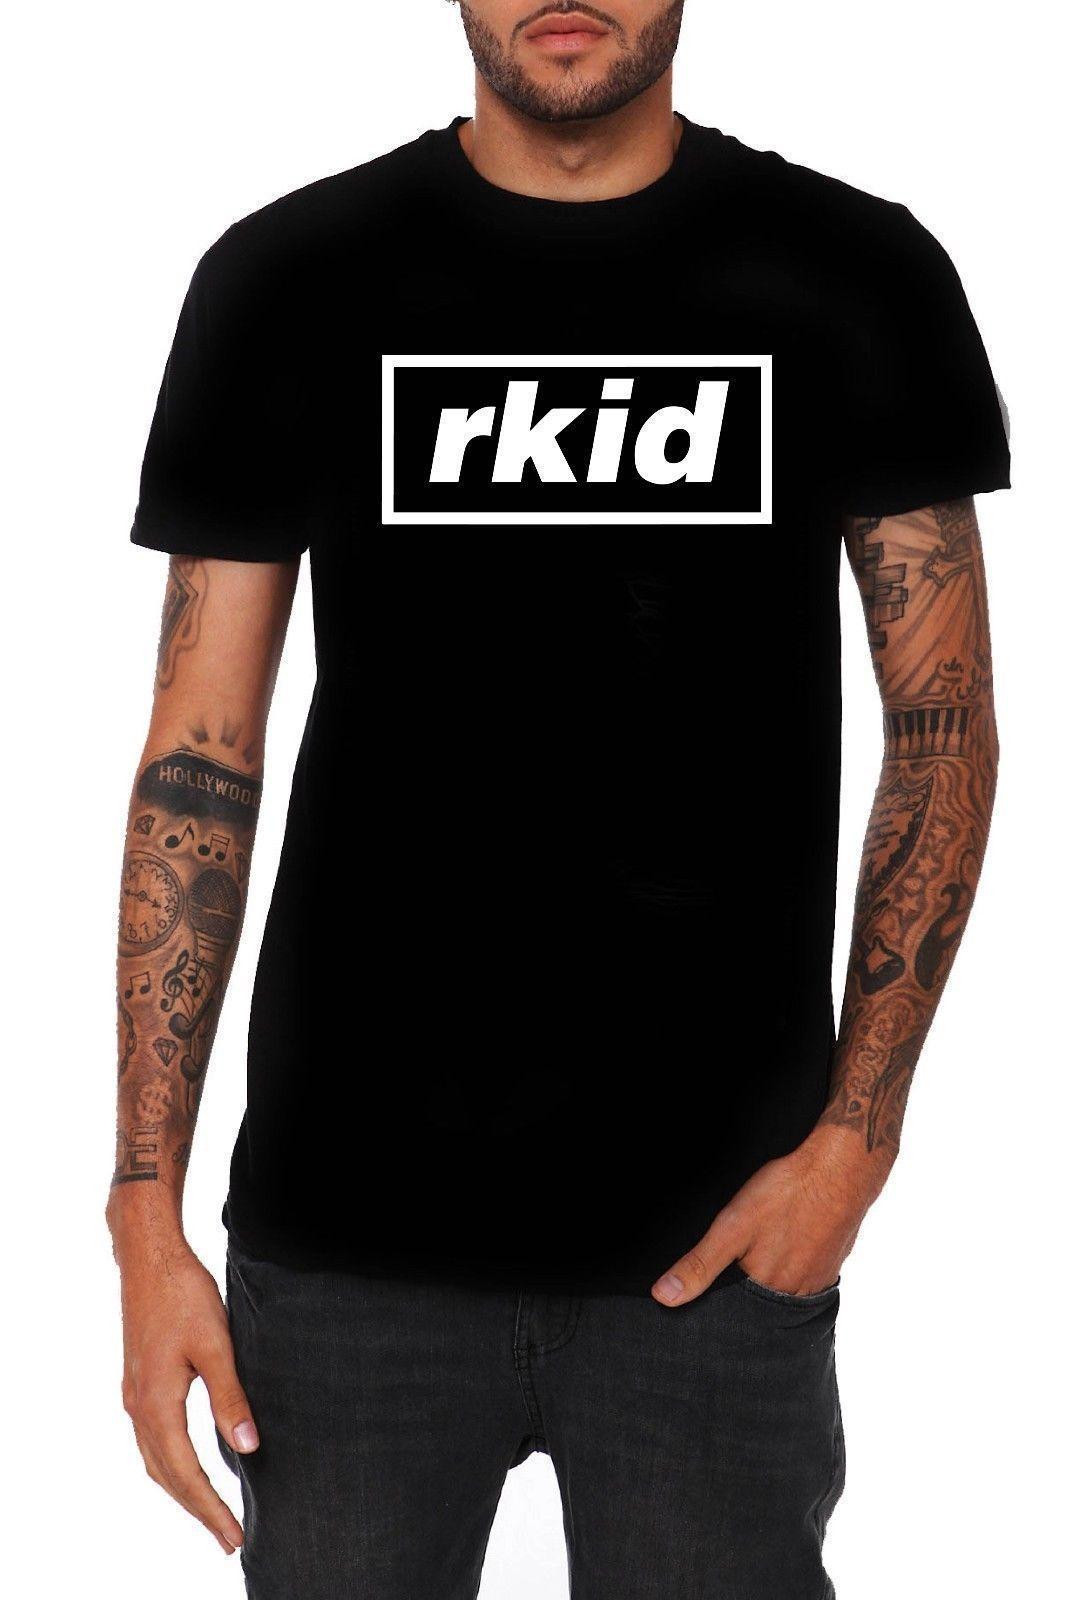 d432aa3e3124c Rkid T Shirt Liam Gallagher Oasis Concert Tickets Print Short Sleeve Men  Top Novelty T Shirts Men S Brand Clothing T Shirt With Online Shop T Shirt  From ...